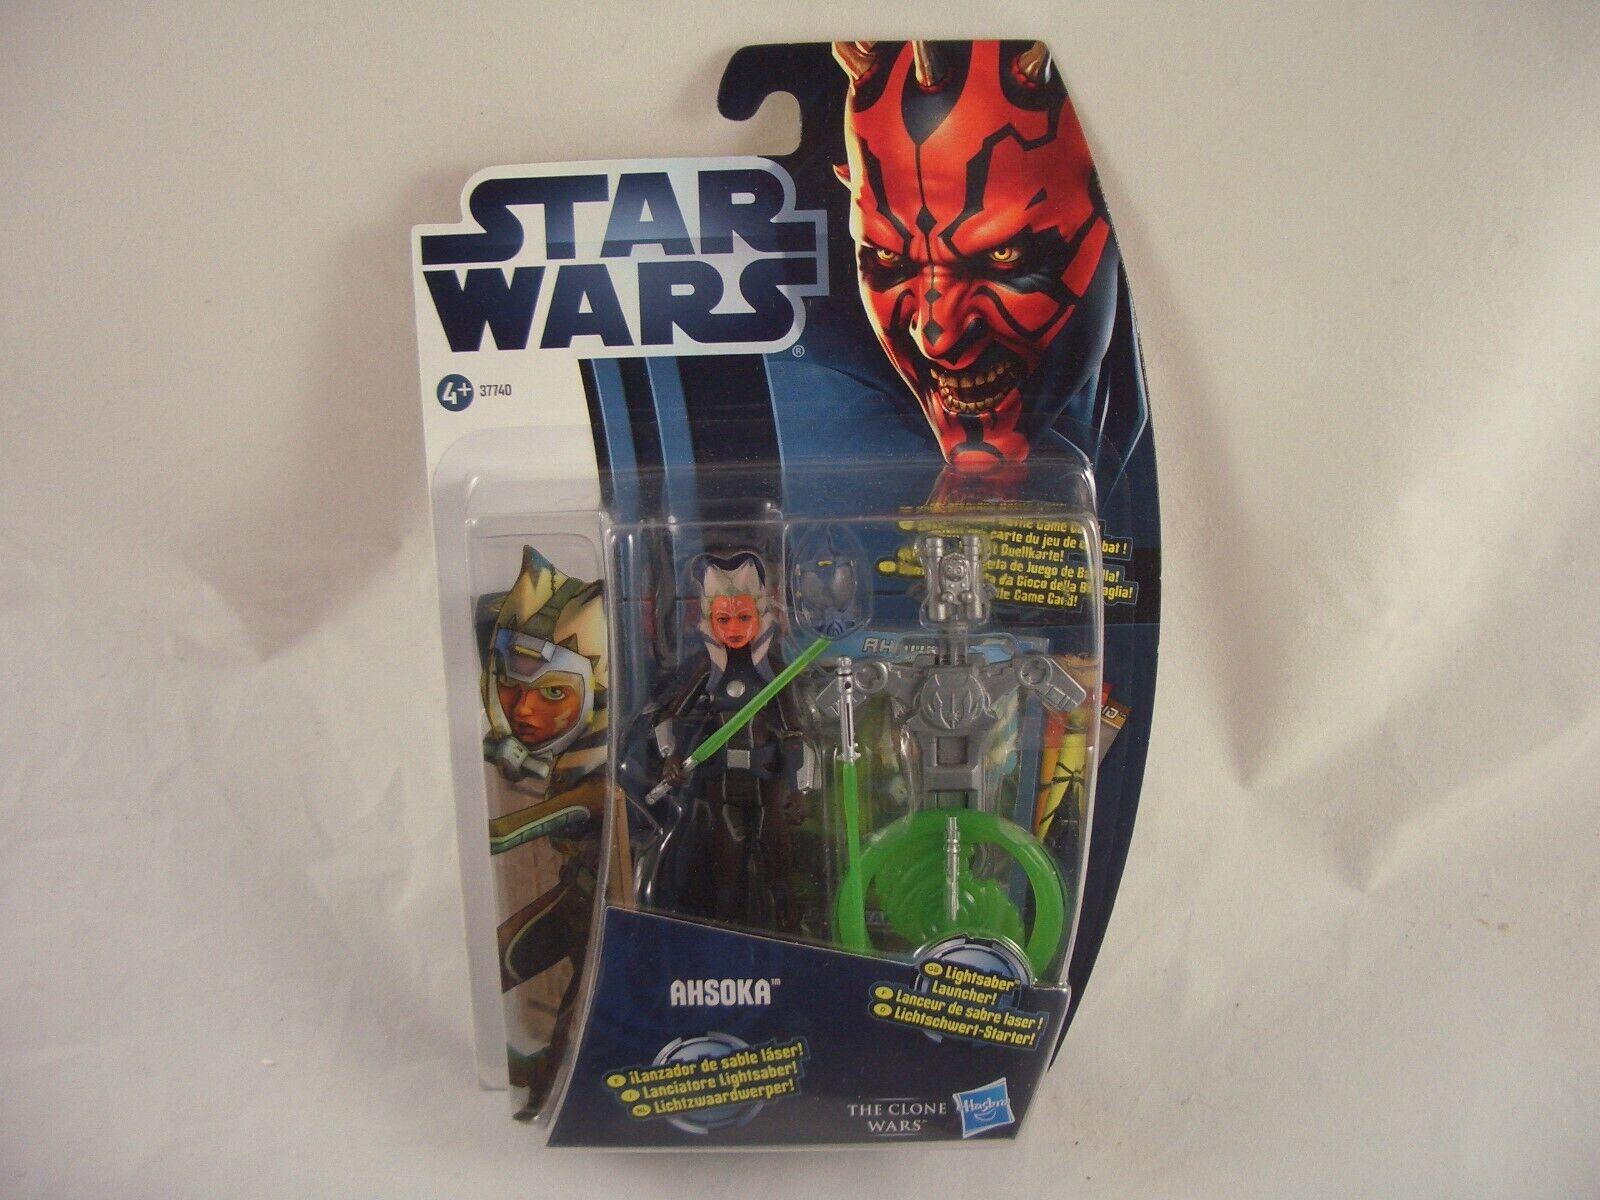 Star Wars Clone Wars Ahsoka CW15 Action Figure